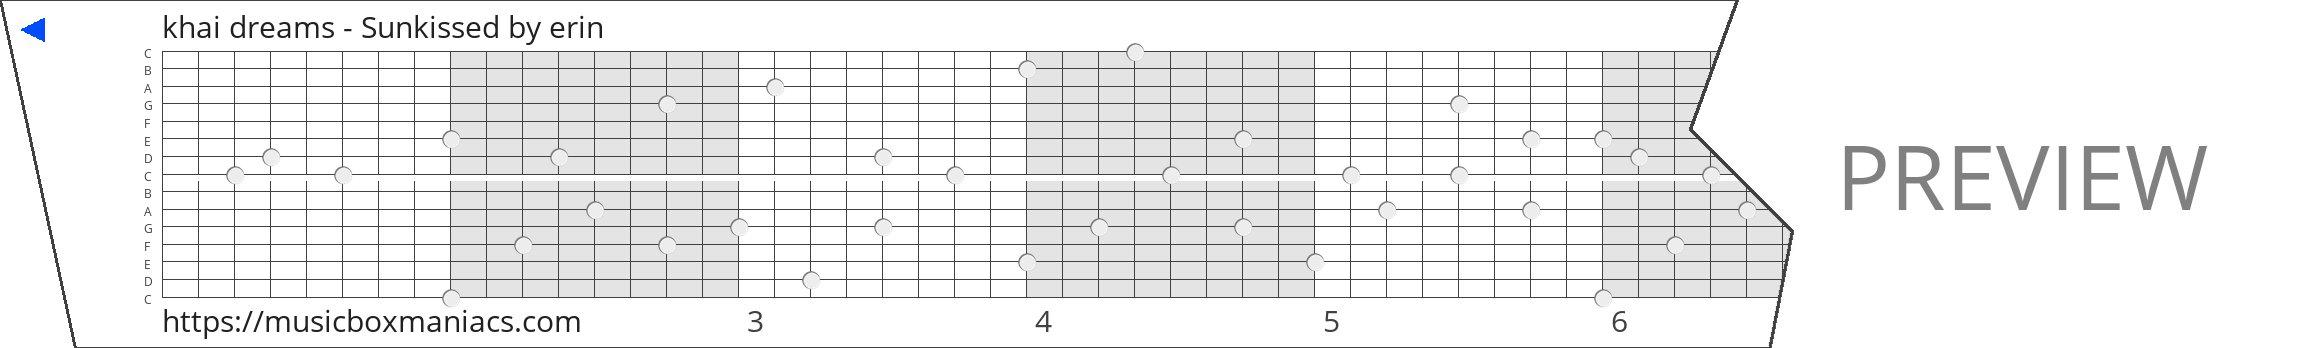 khai dreams - Sunkissed 15 note music box paper strip